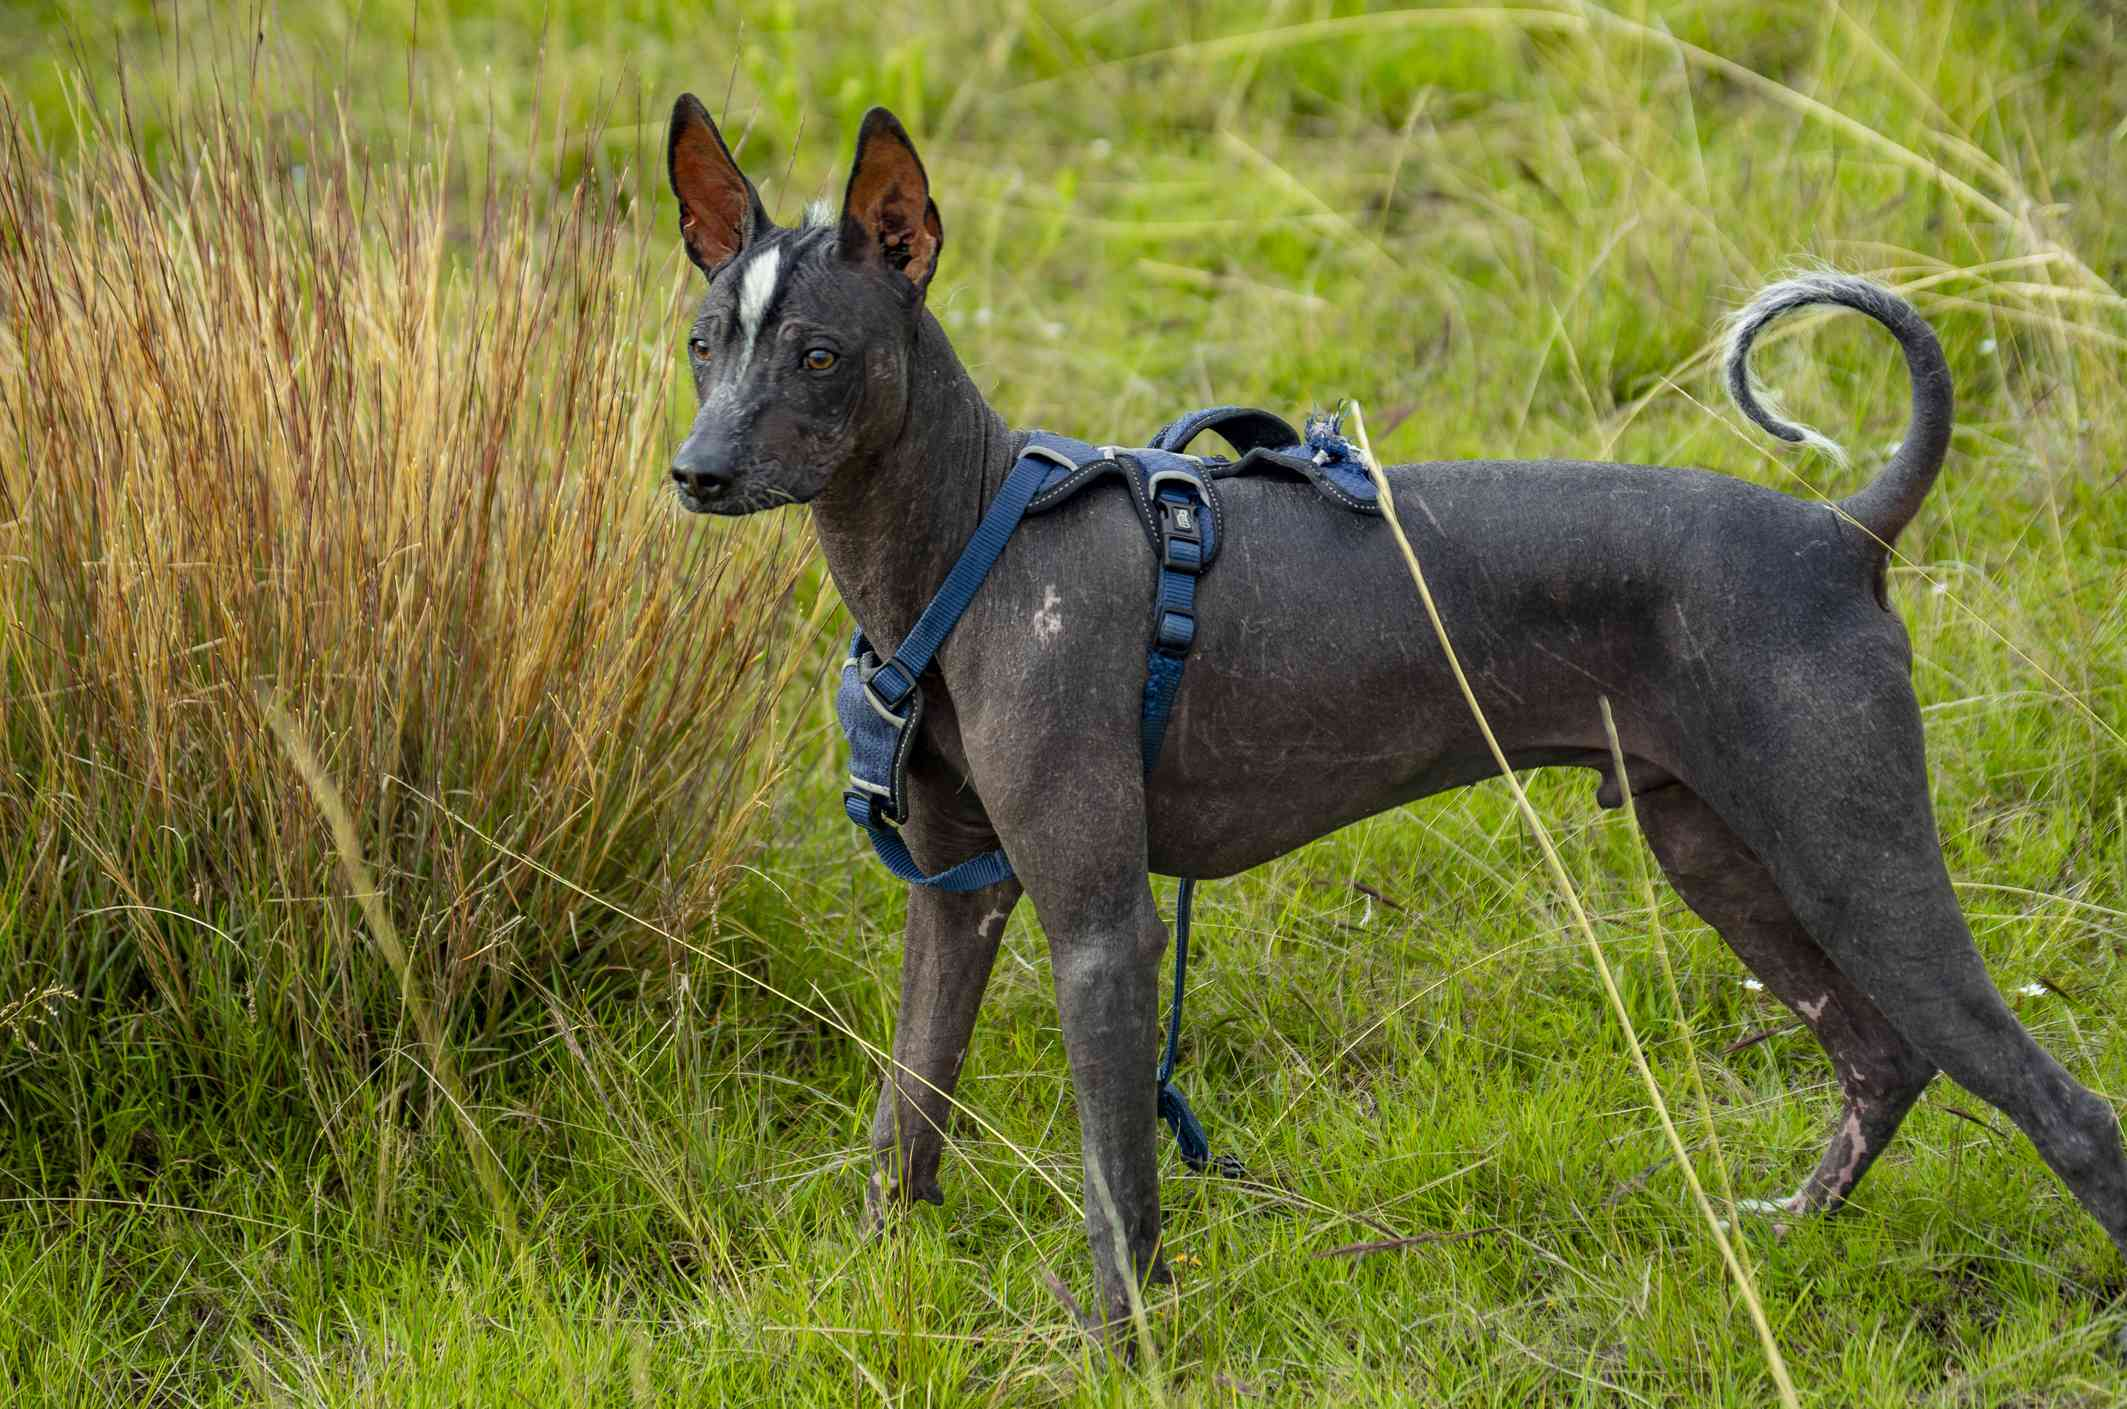 Dark gray Peruvian Inca Orchid standing in field in a blue harness.